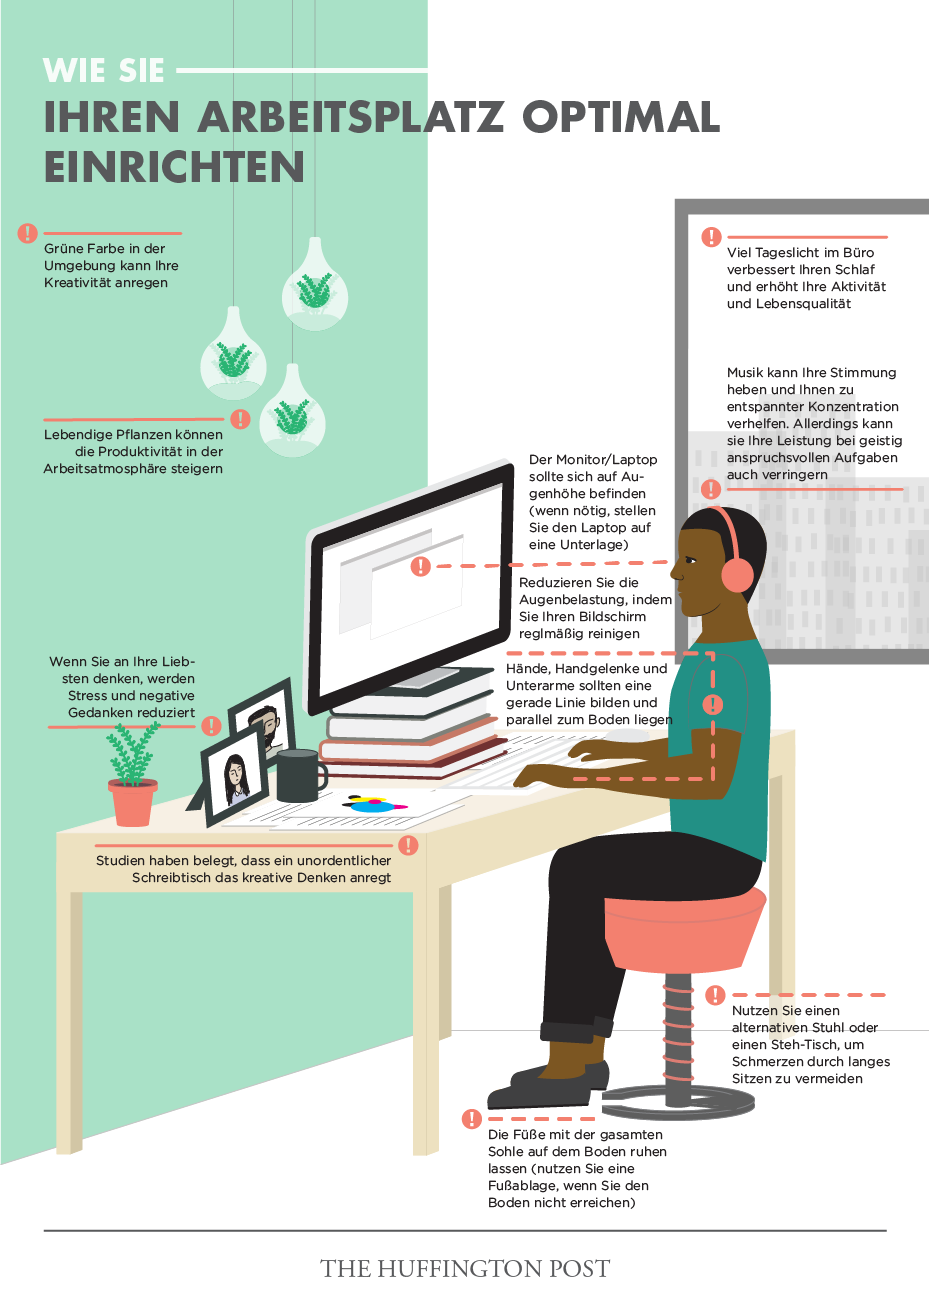 Messy desk study definition